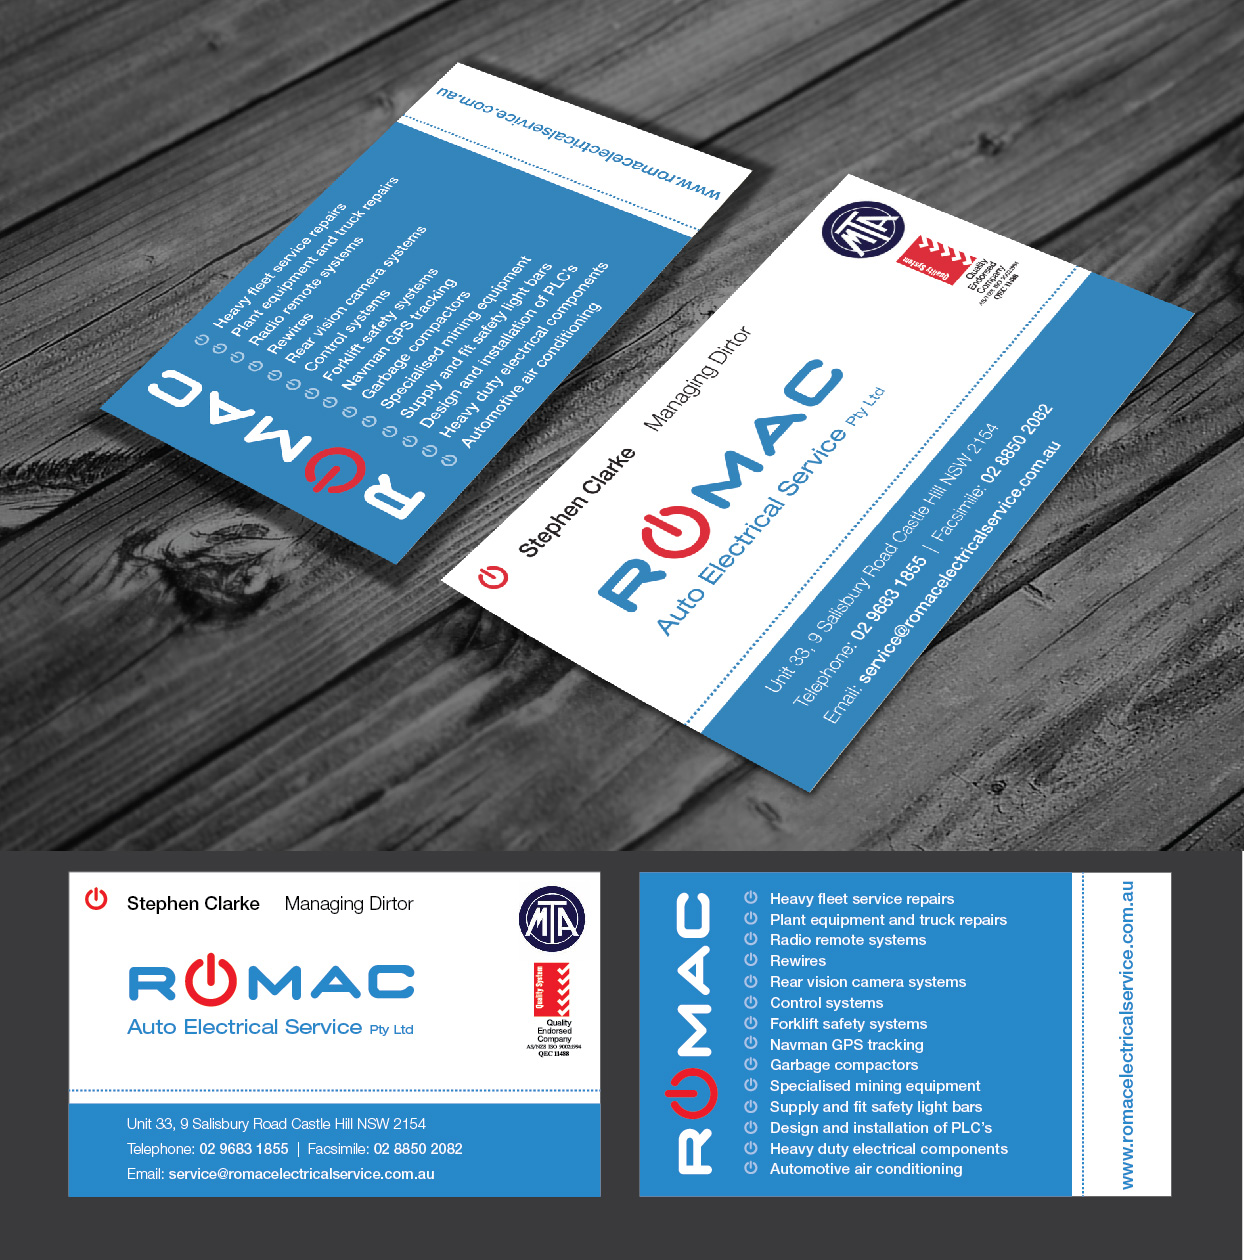 Business business card design for printsales by gastinkova business business card design for printsales in australia design 4016615 reheart Gallery